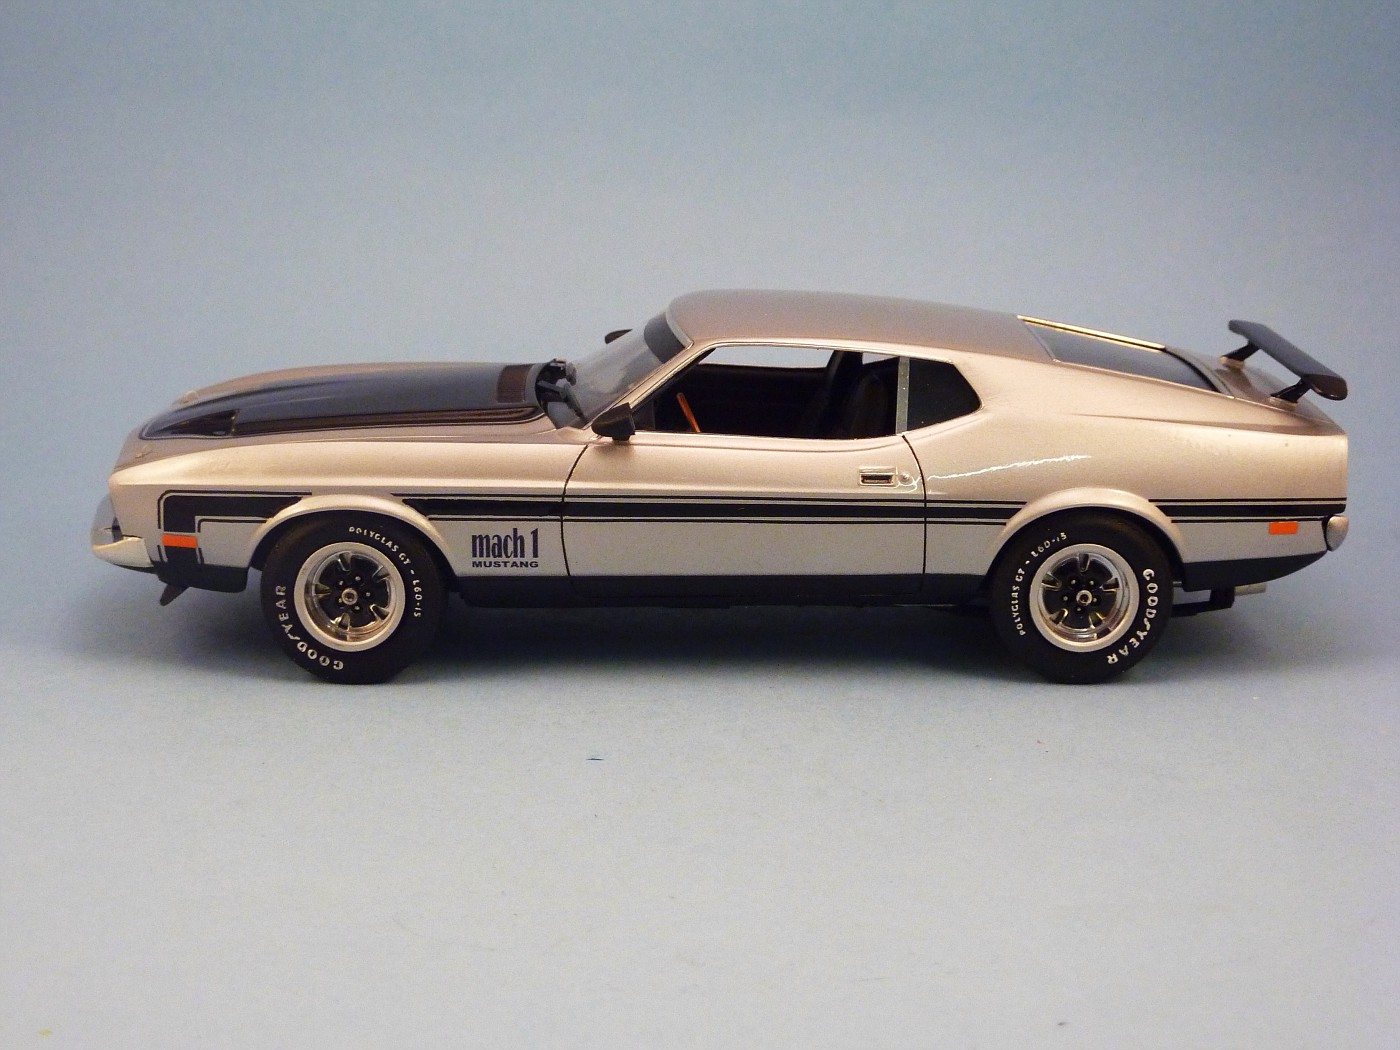 Restauration Mustang Mach 1 1971 terminée OtosfinalesMustangMach11971003-vi